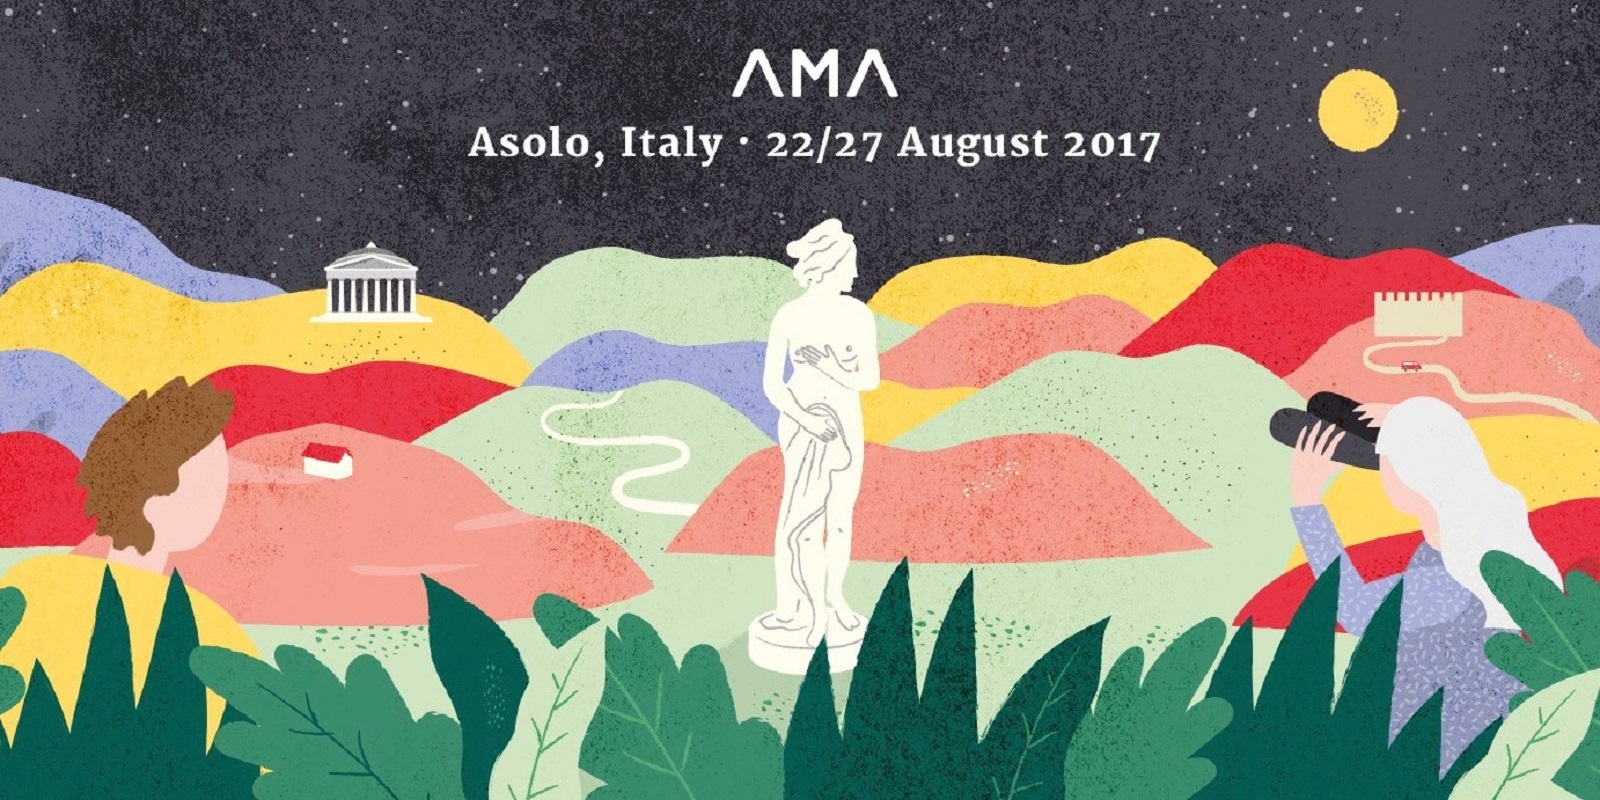 ASOLO ESISTE E VIVE ALL'AMA MUSIC FESTIVAL